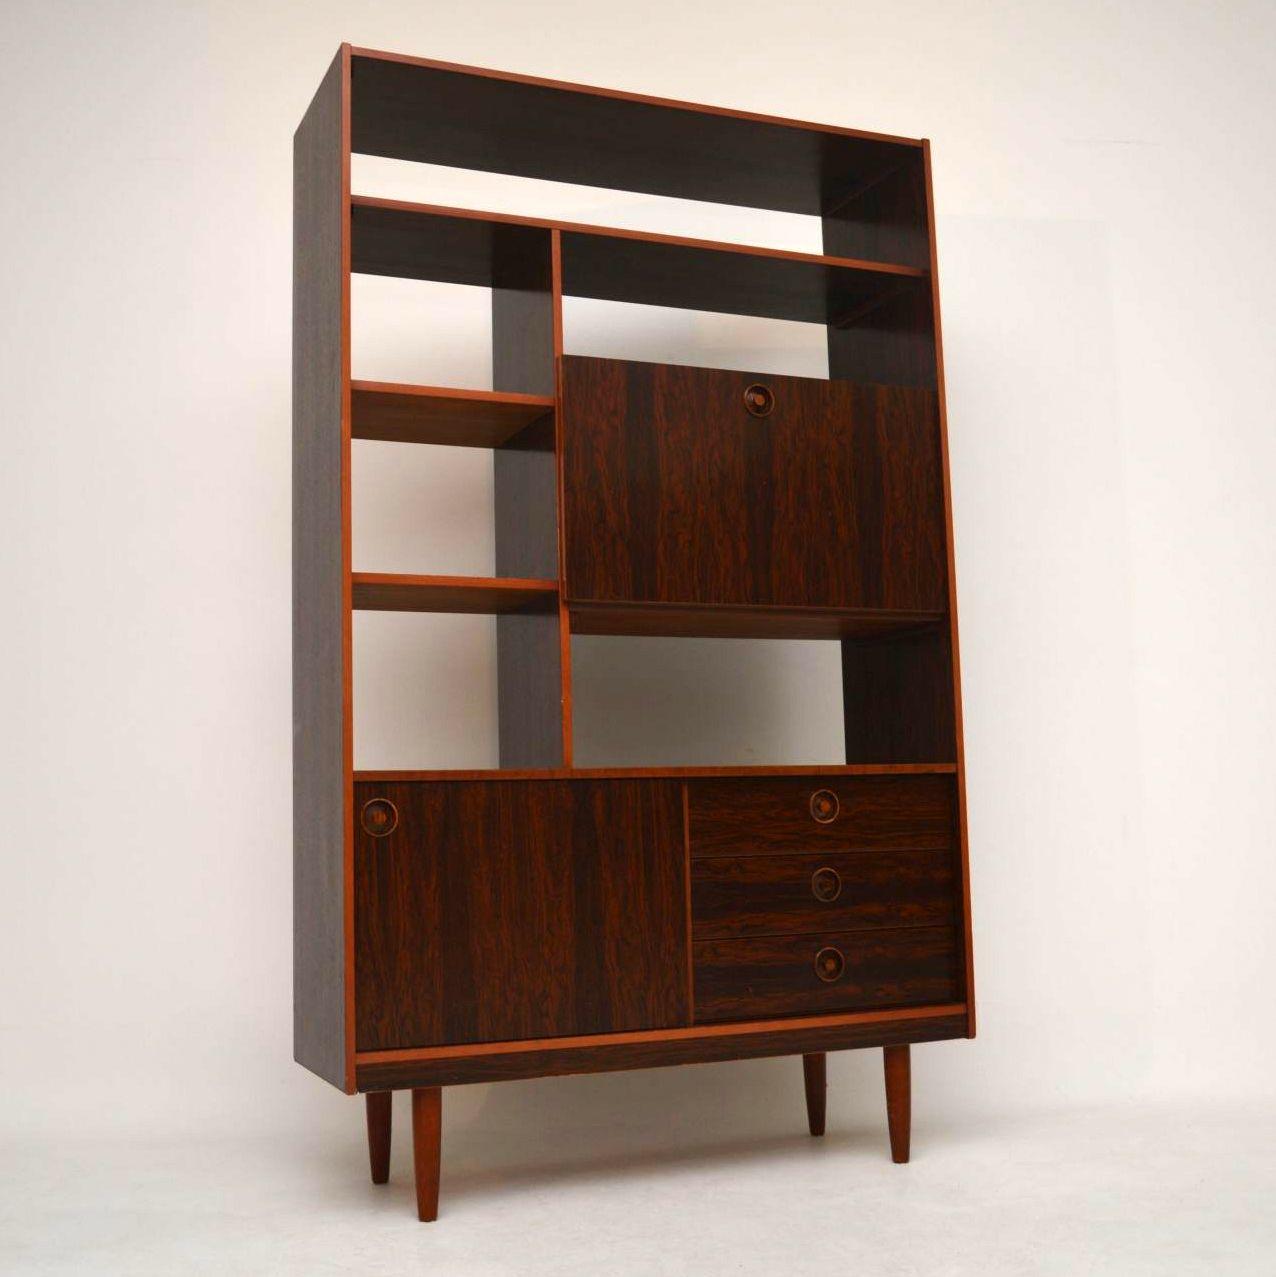 Retro Rosewood Effect Room Divider Bookcase Vintage 1960